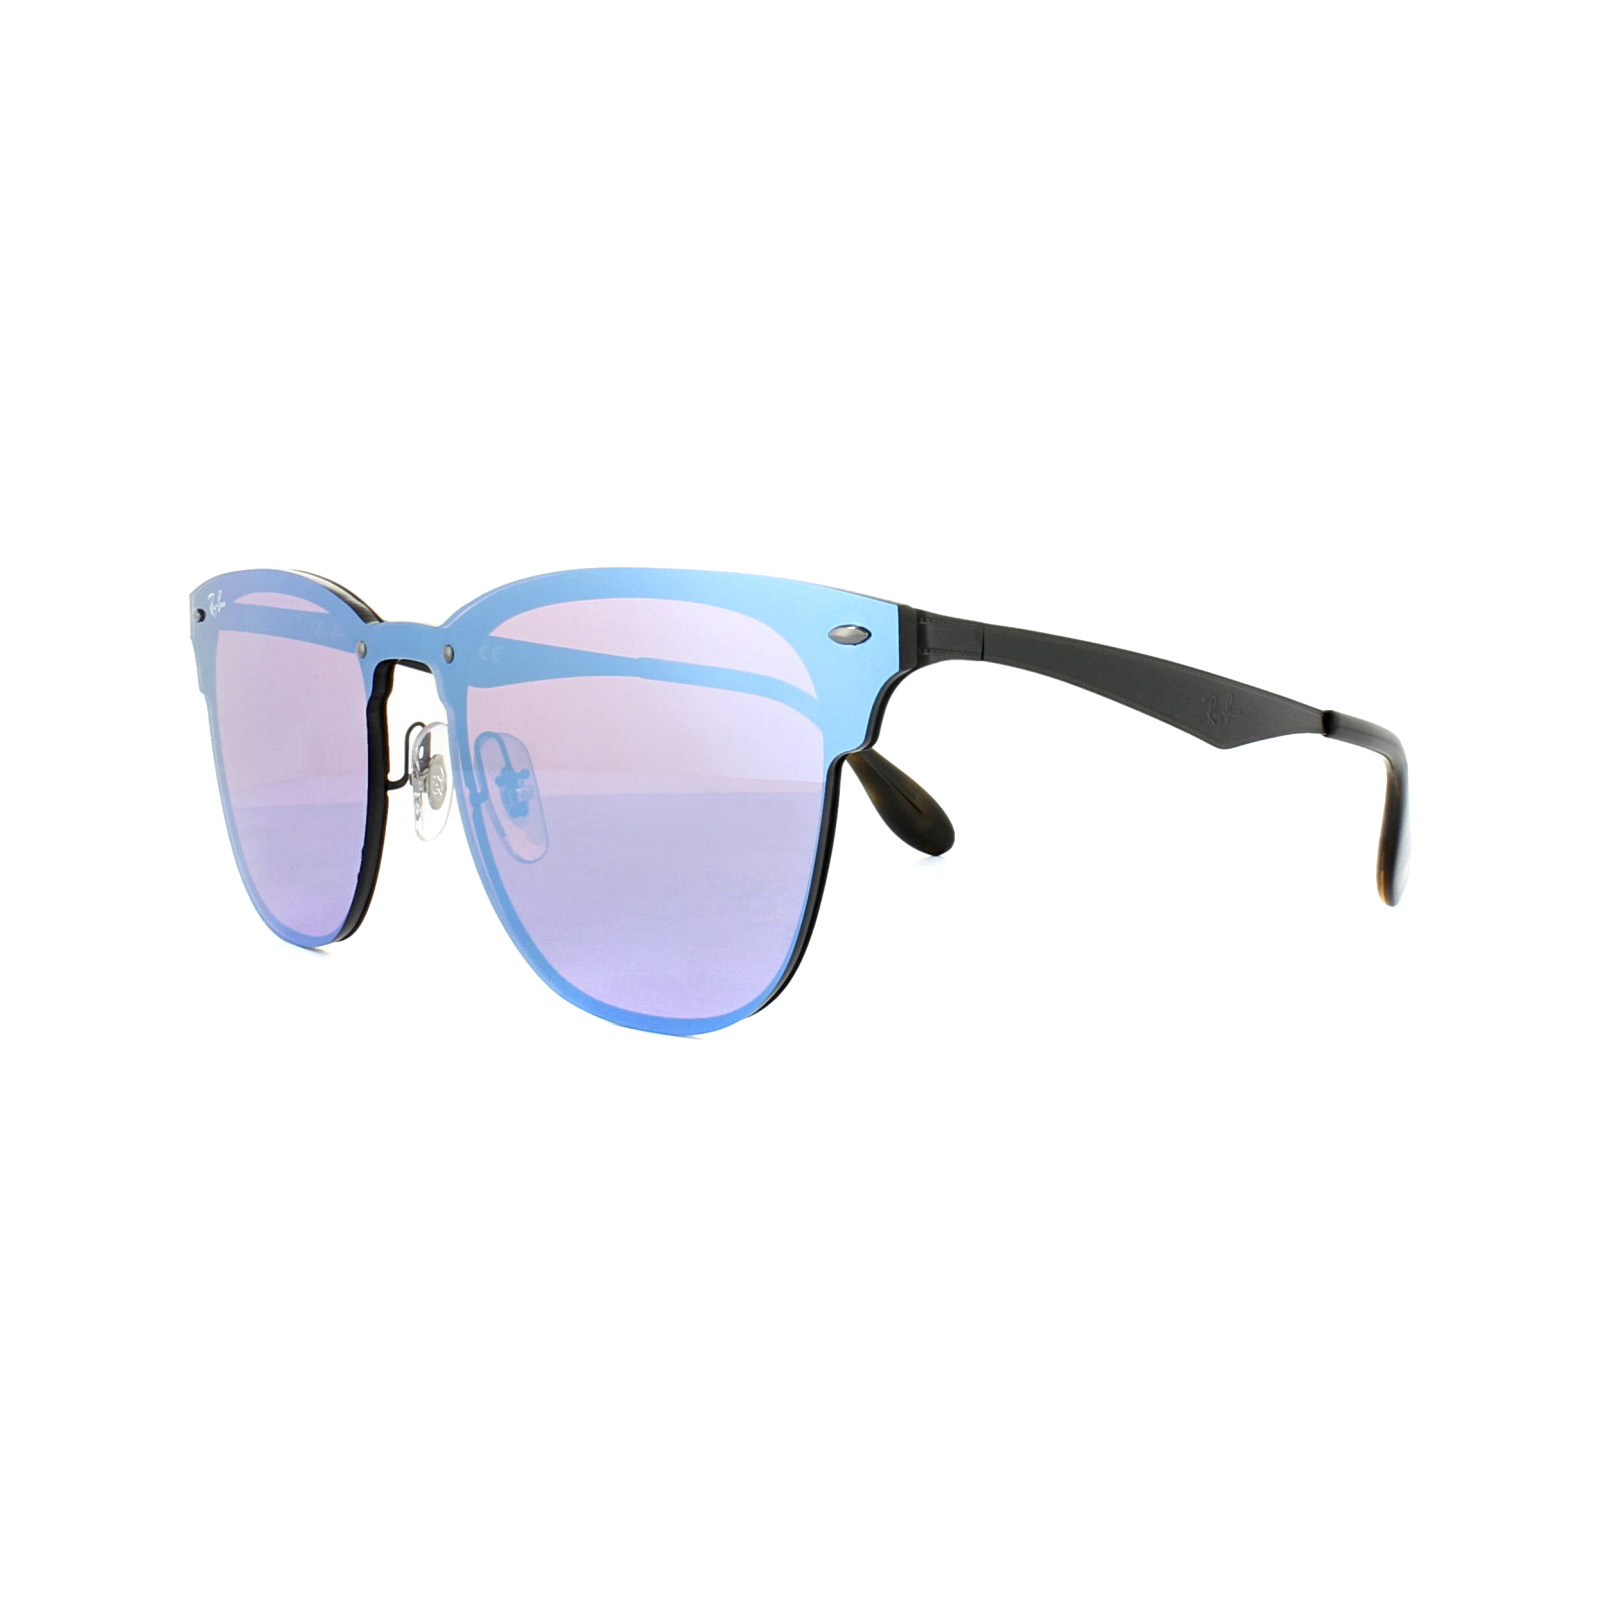 837cce80dd1d6 Sentinel Ray-Ban Sunglasses Blaze Clubmaster 3576N 153 7V Black Dark Violet  Blue Mirror